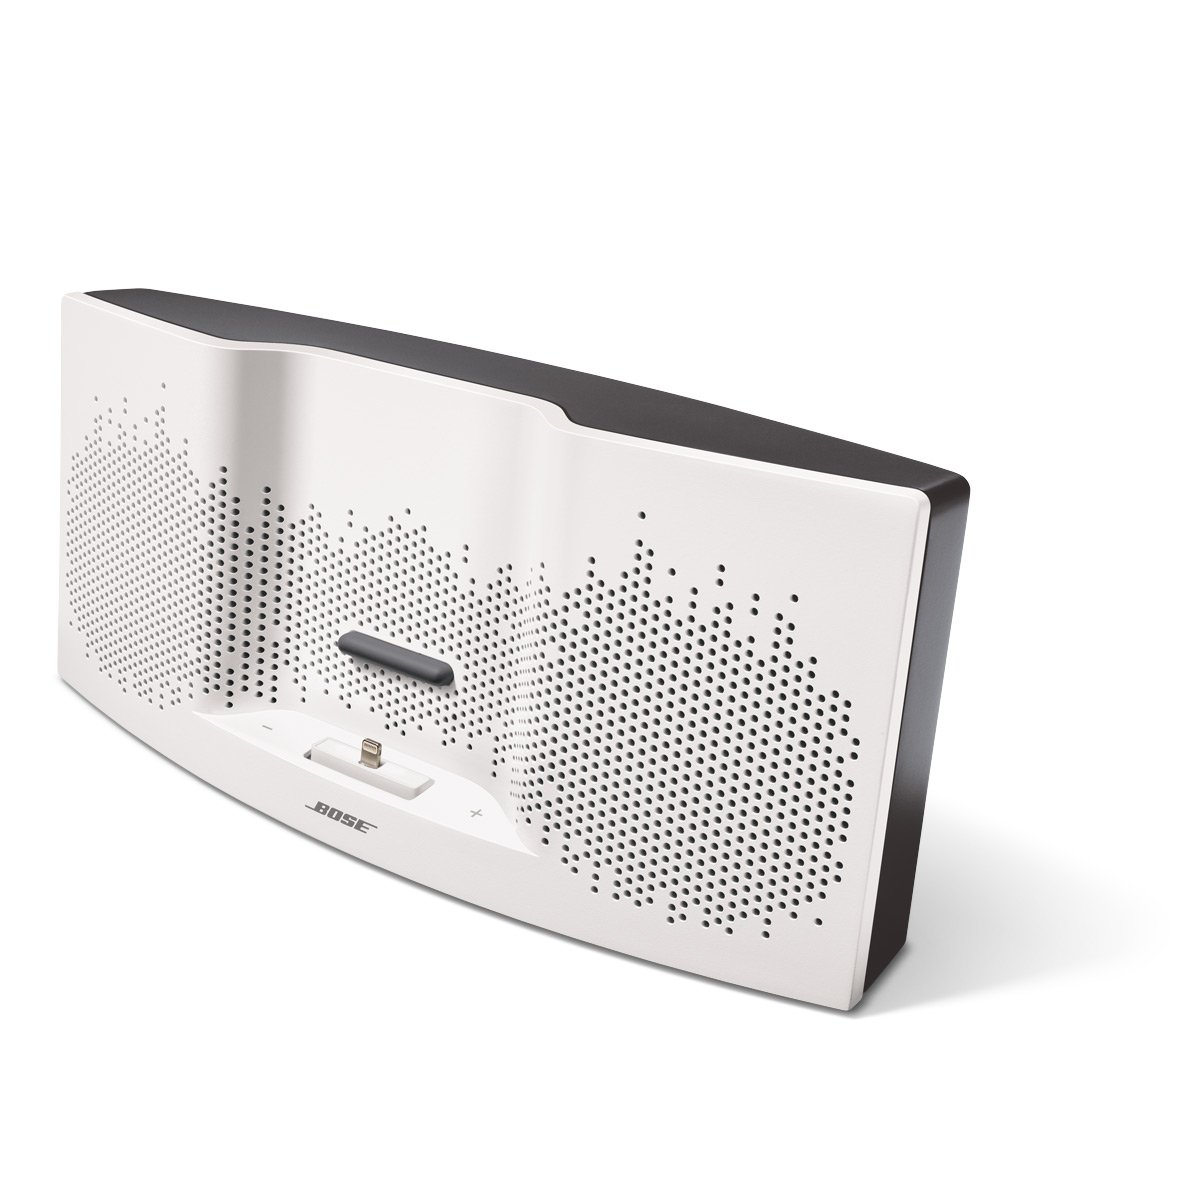 Bose ® SoundDock XT Lautsprecher weiß/dunkelgrau: Amazon.de: Audio ...